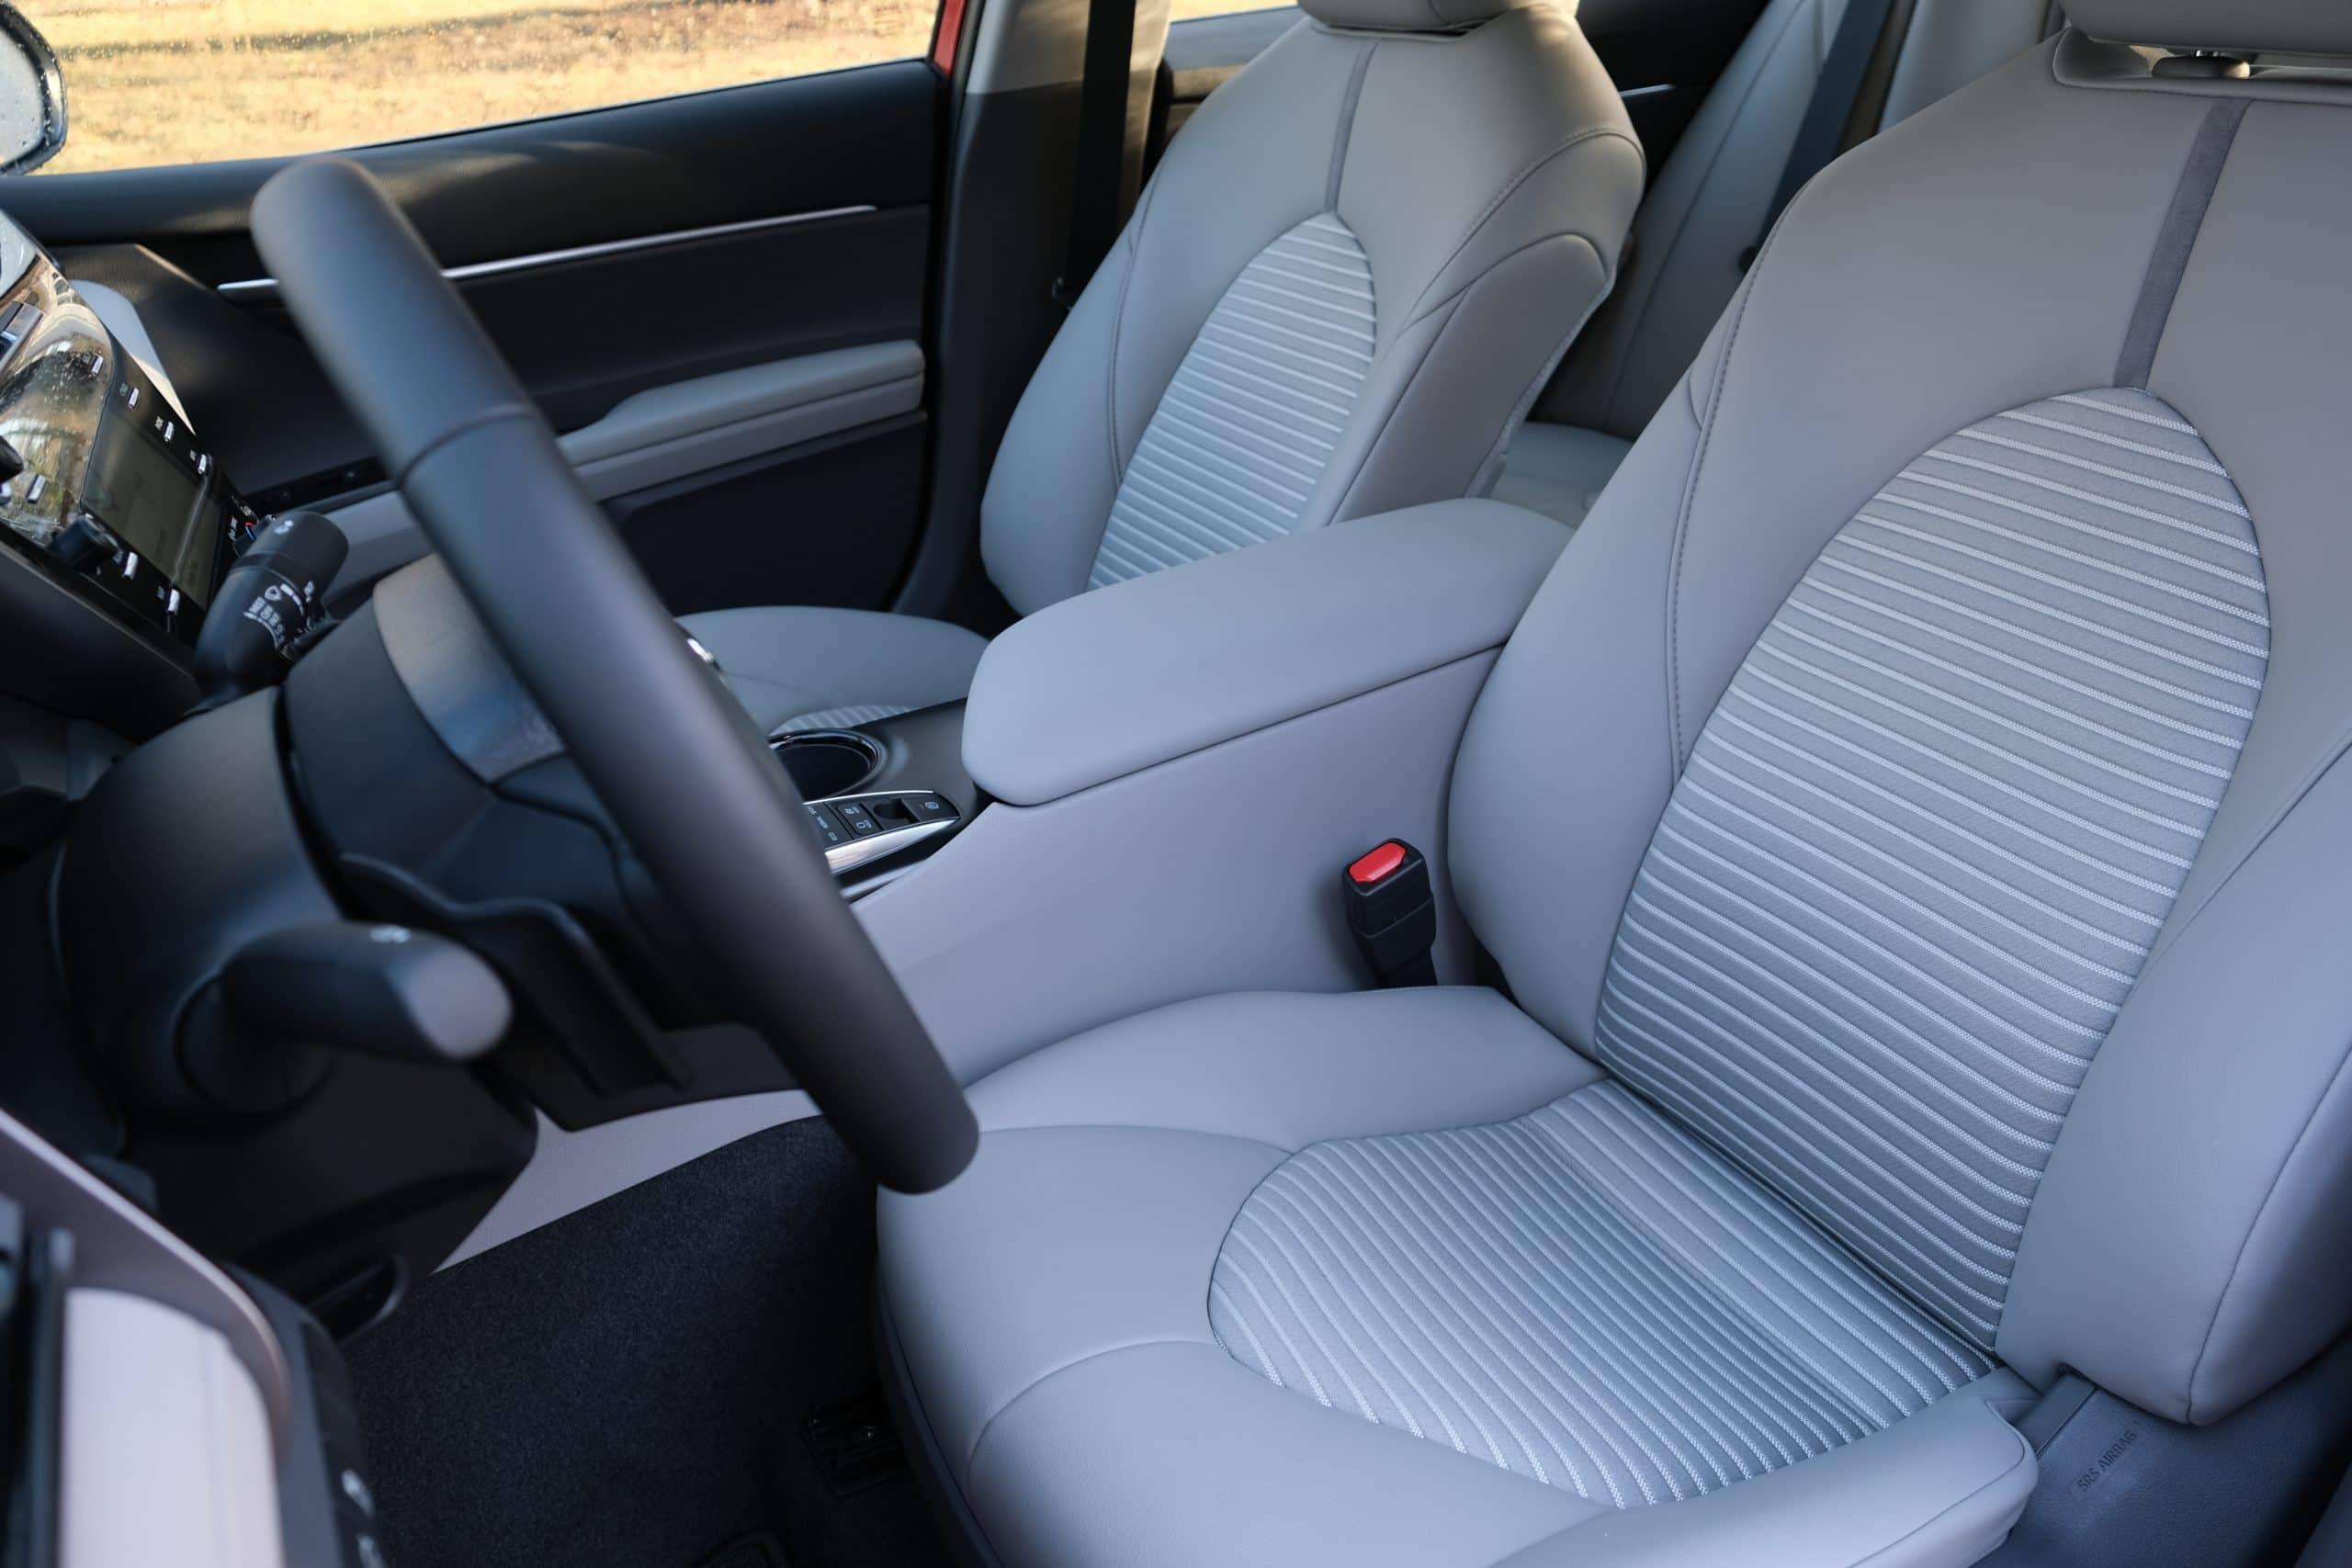 2020 Camry Hybrid SE - Interior